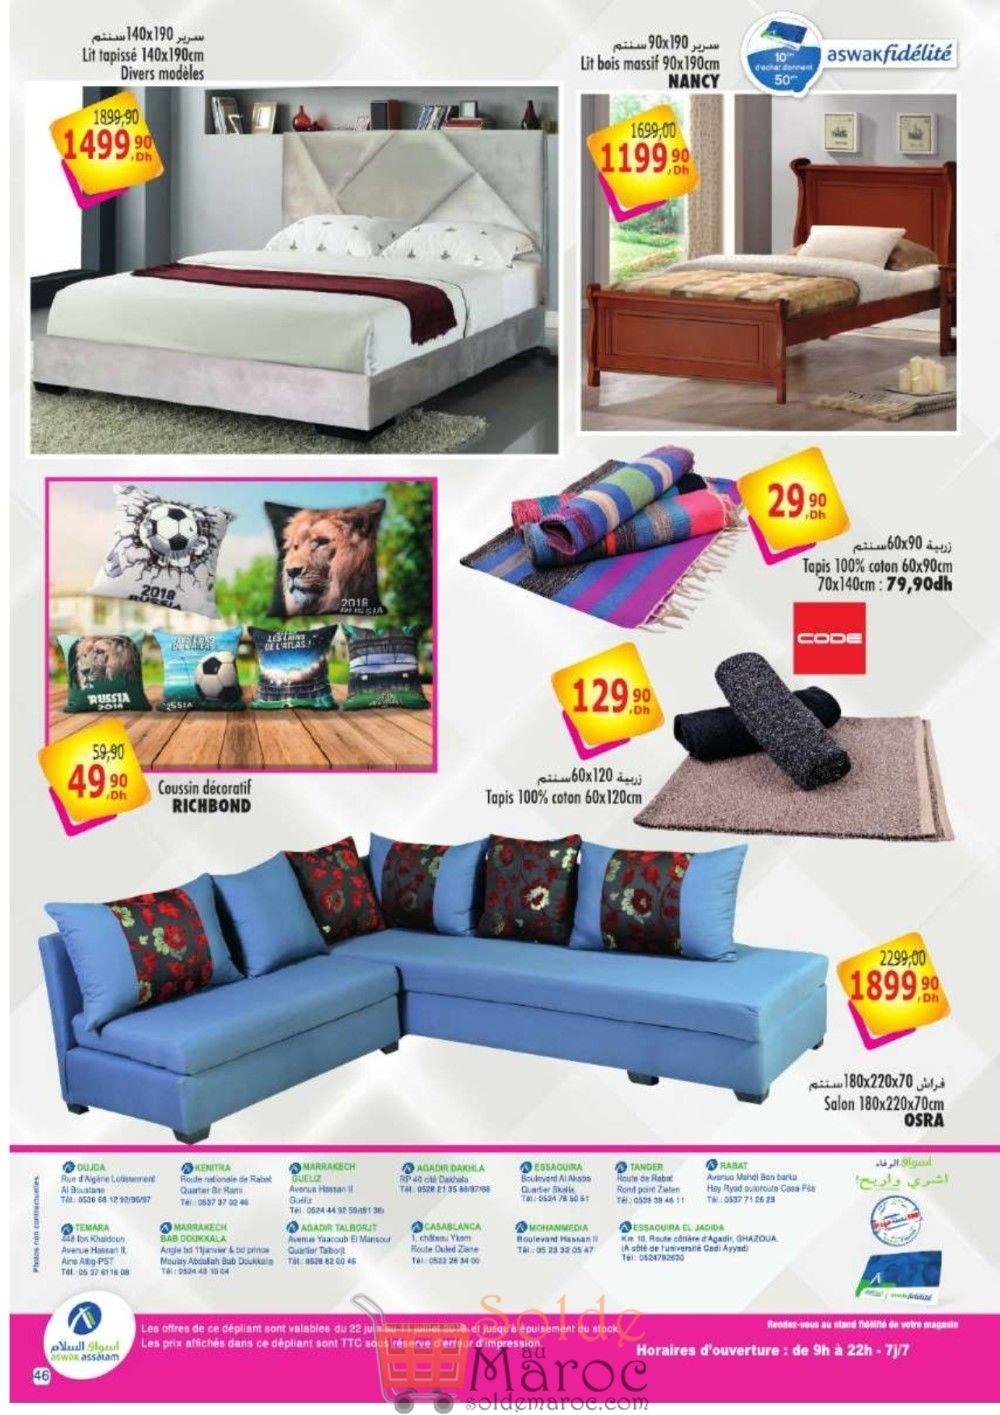 Catalogue Aswak Assalam du 22 Juin au 11 Juillet 2018